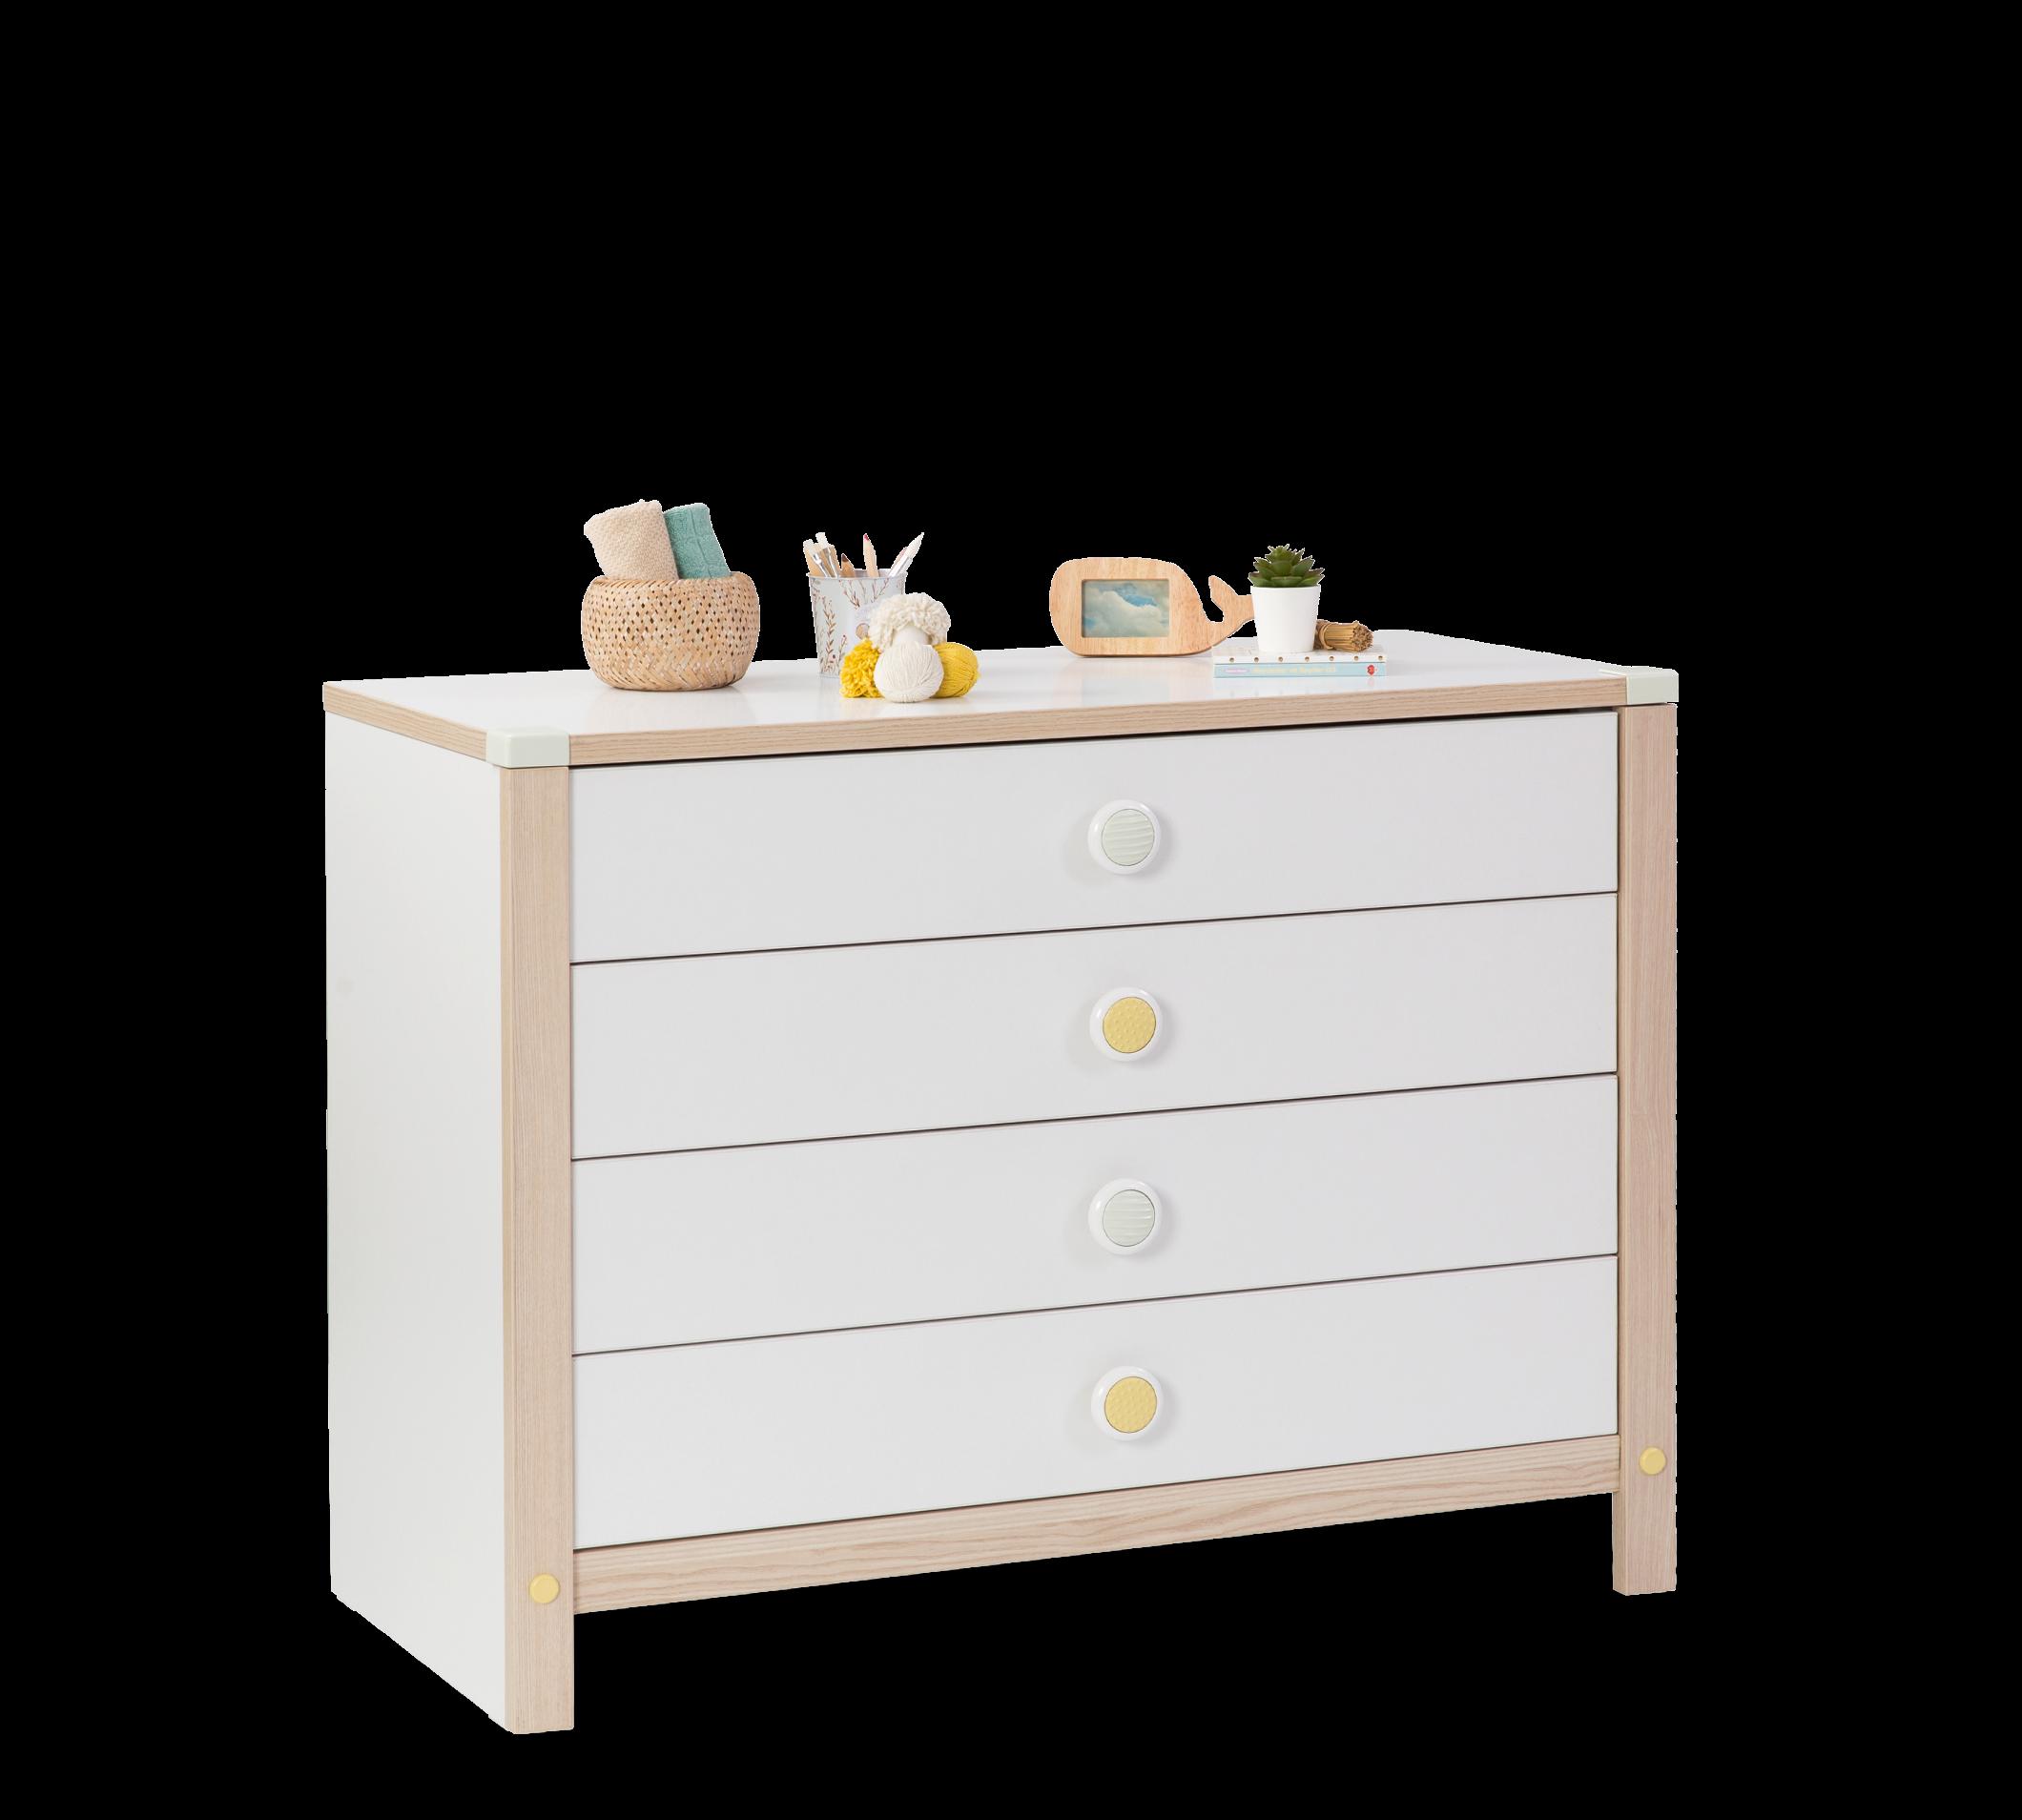 Comoda din pal, cu 4 sertare pentru bebe Montessori Baby Alb / Natural, l106xA52xH81 cm imagine